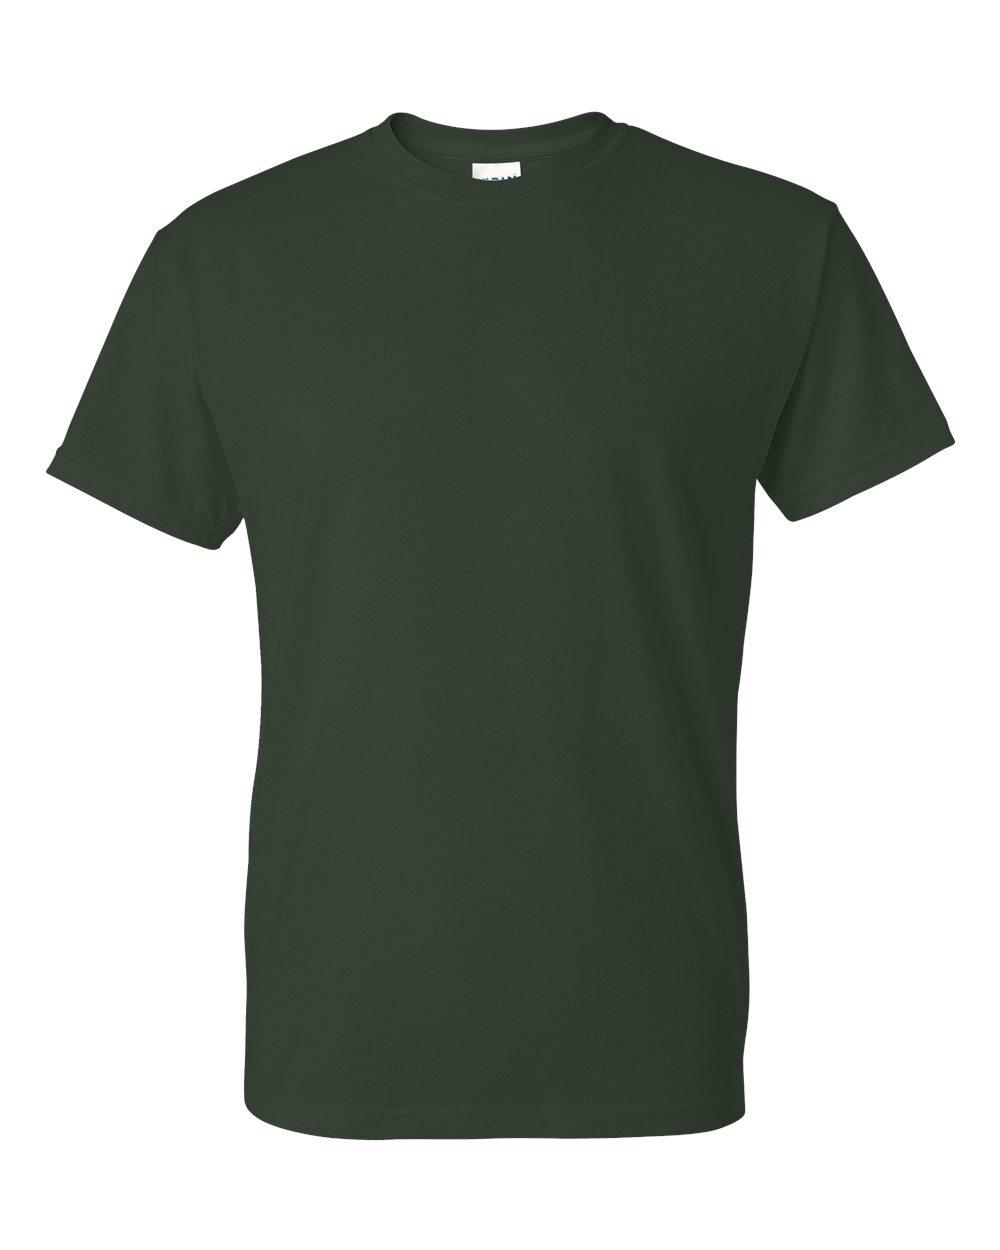 T Shirt Heat Transfer